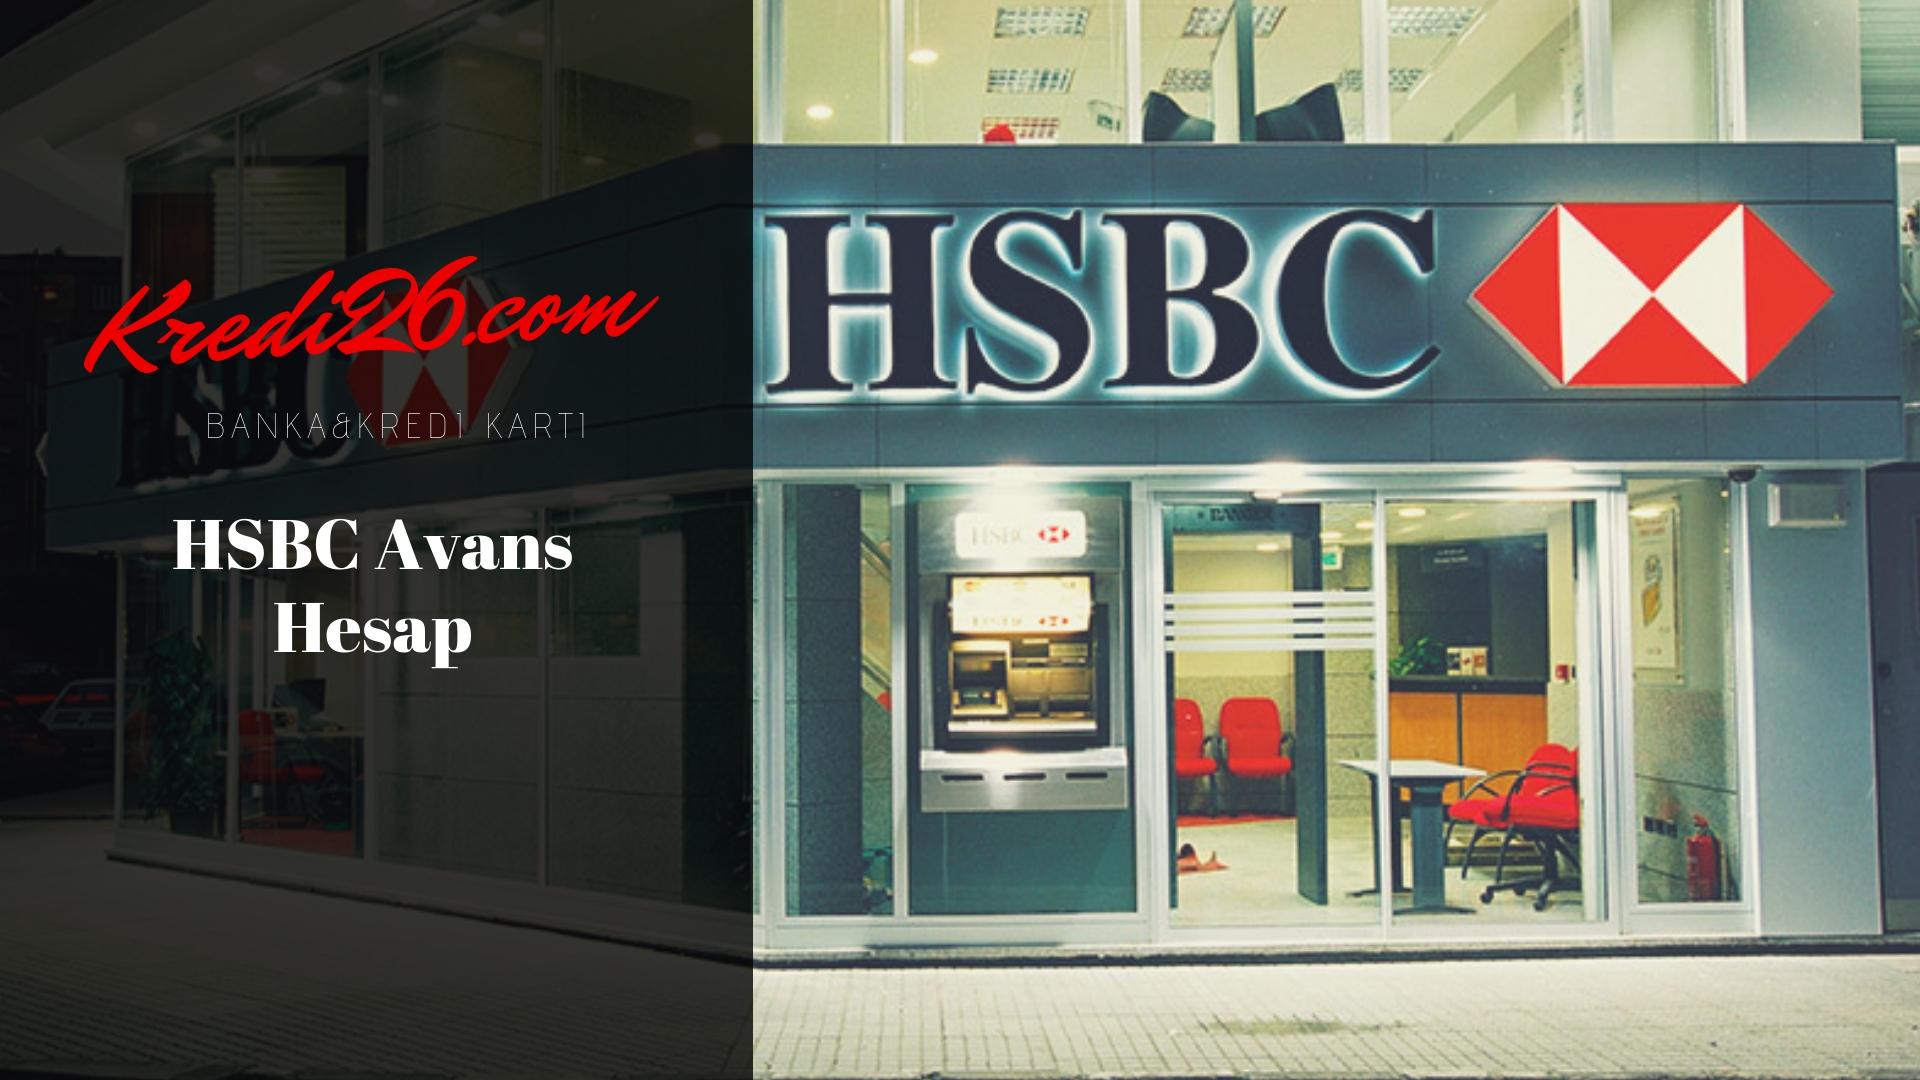 taksitli nakit avans hesap makinesi - HSBC